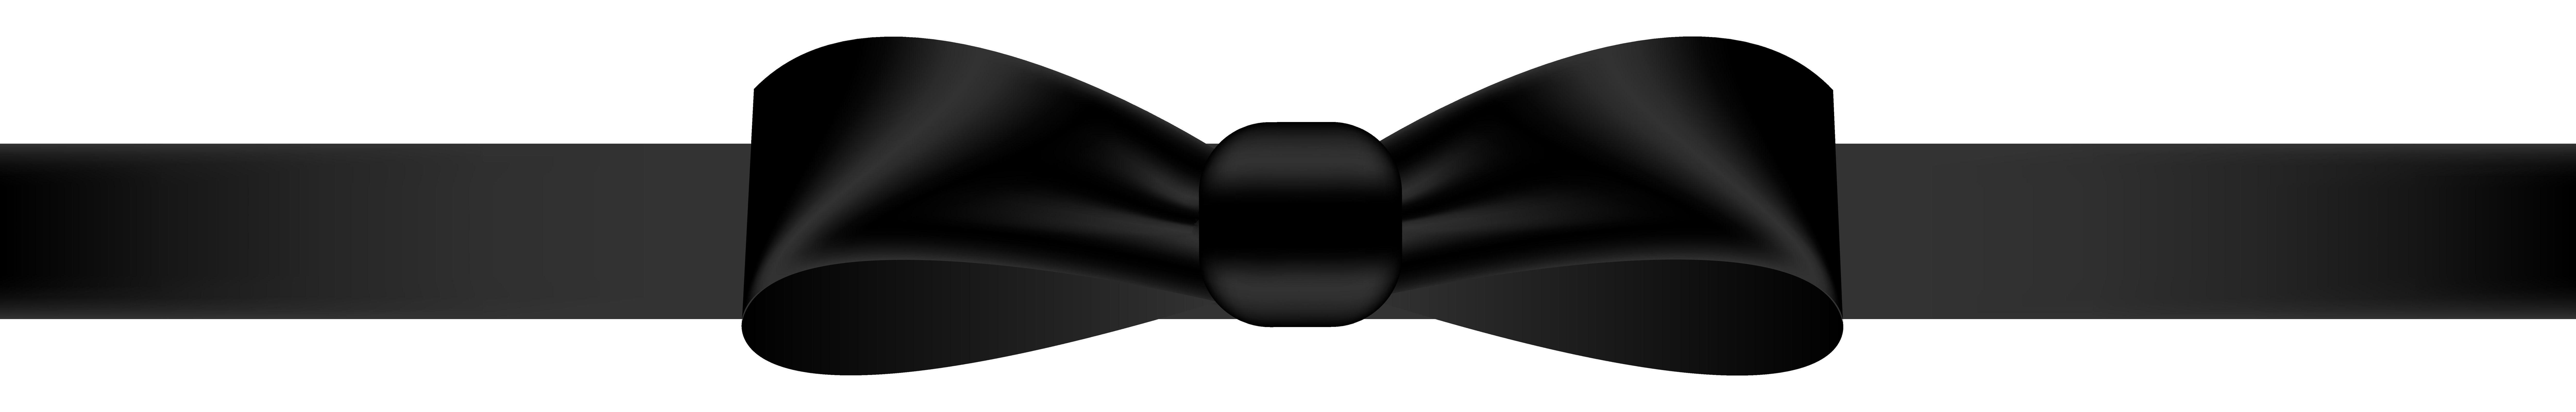 Black Bow Transparent Png Clip Art Image Art Images Black Bow Clip Art